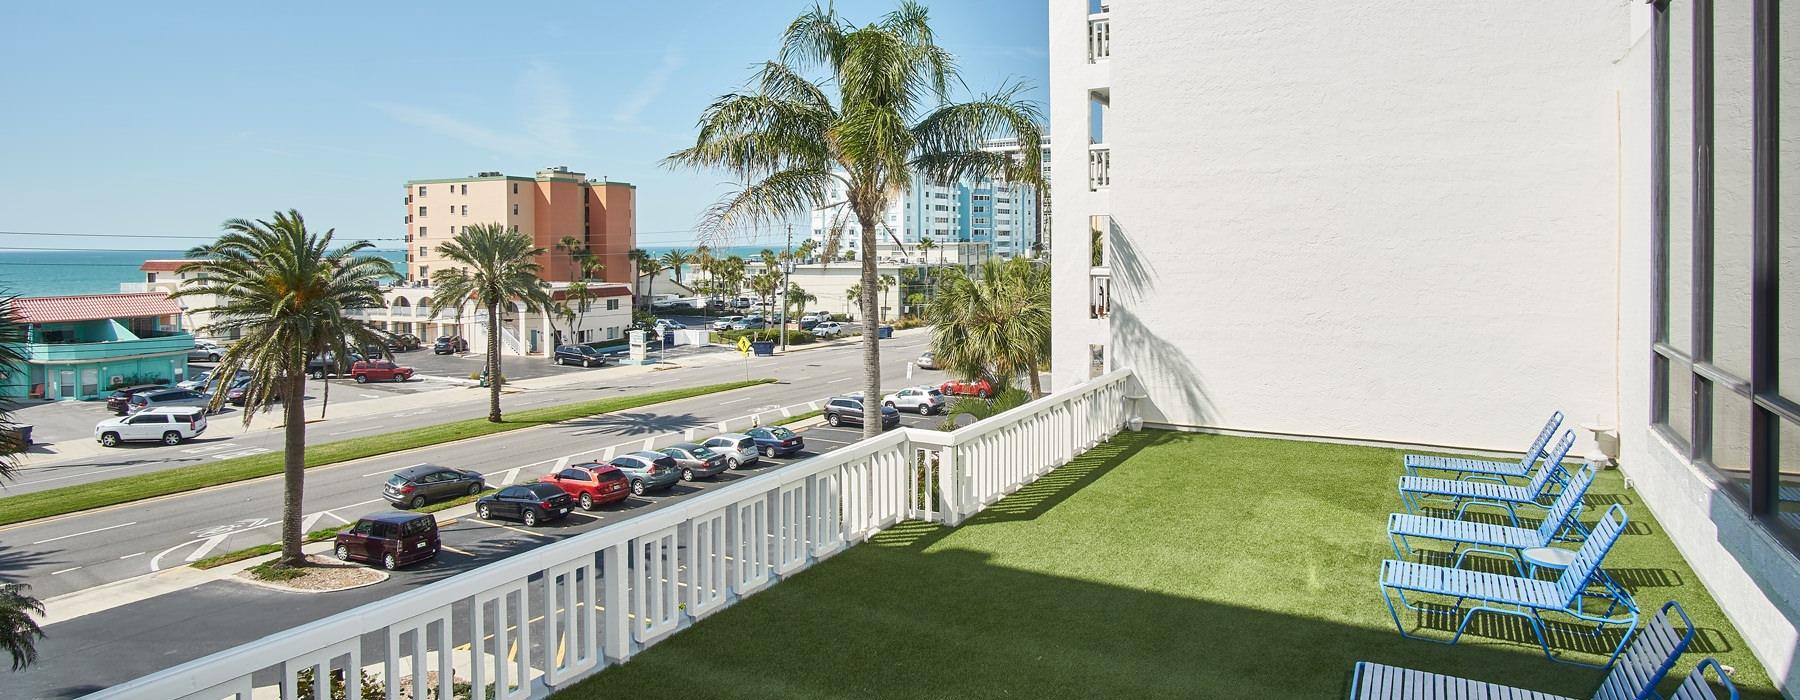 patio with ocean and neighborhood views